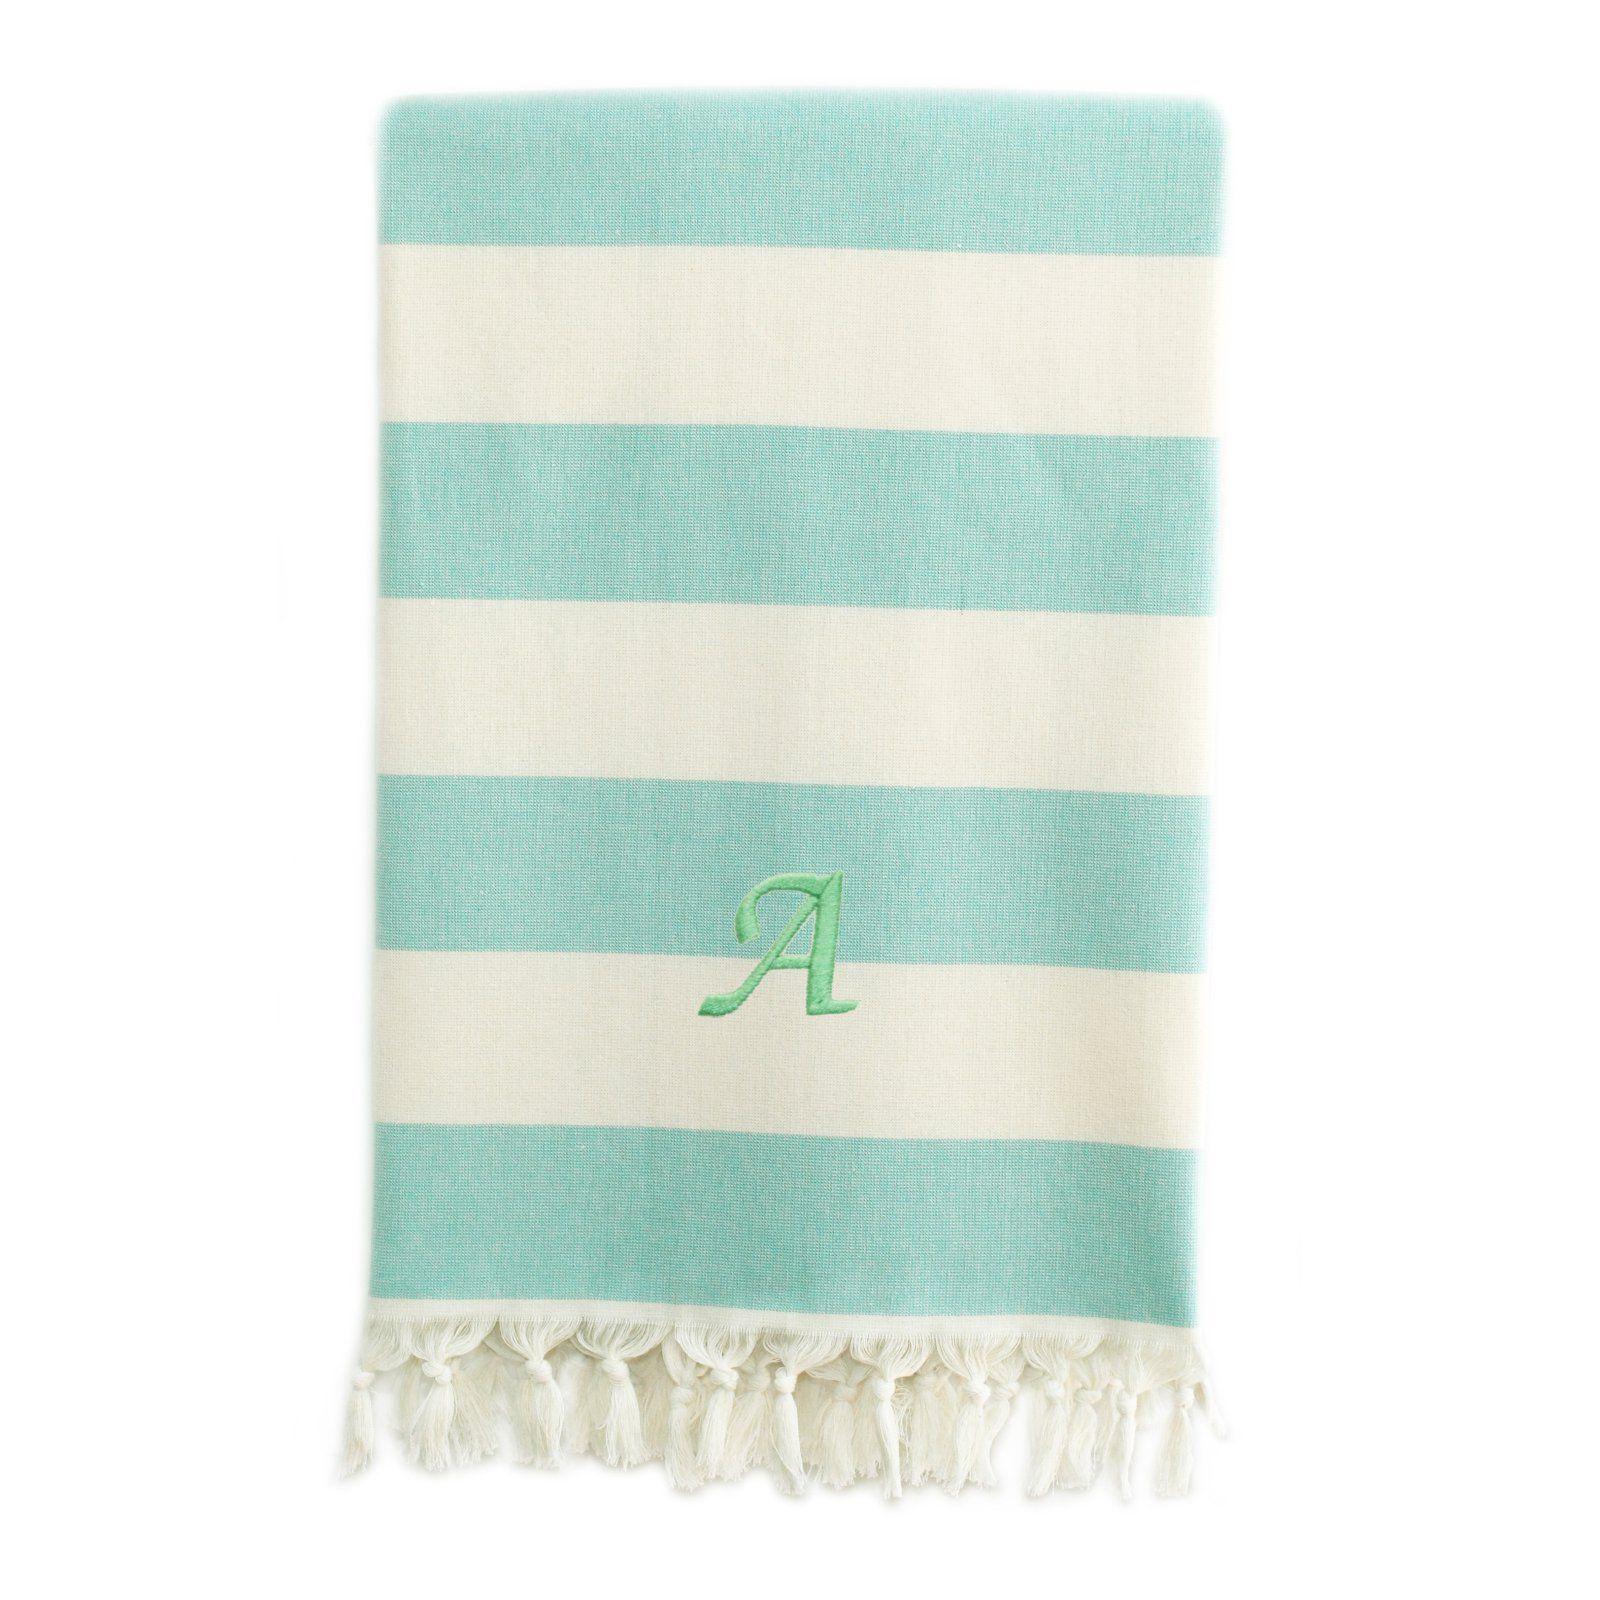 Linum Home Textiles Monogrammed Patara Pestemal Towel Aqua Linum